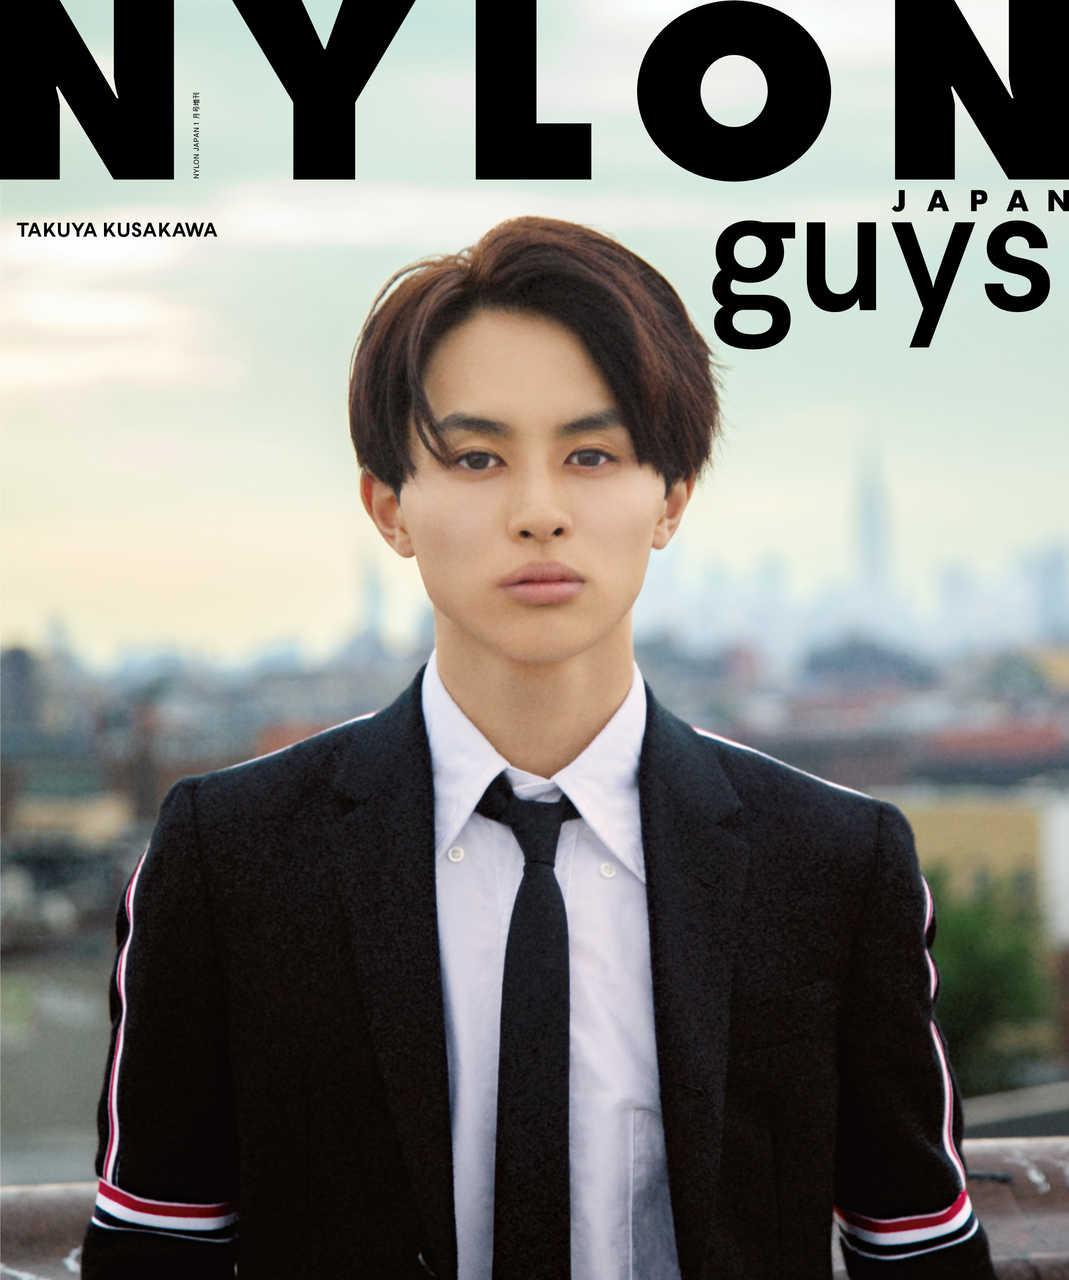 『NYLON guys JAPAN TAKUYA STYLE BOOK』【通常版】